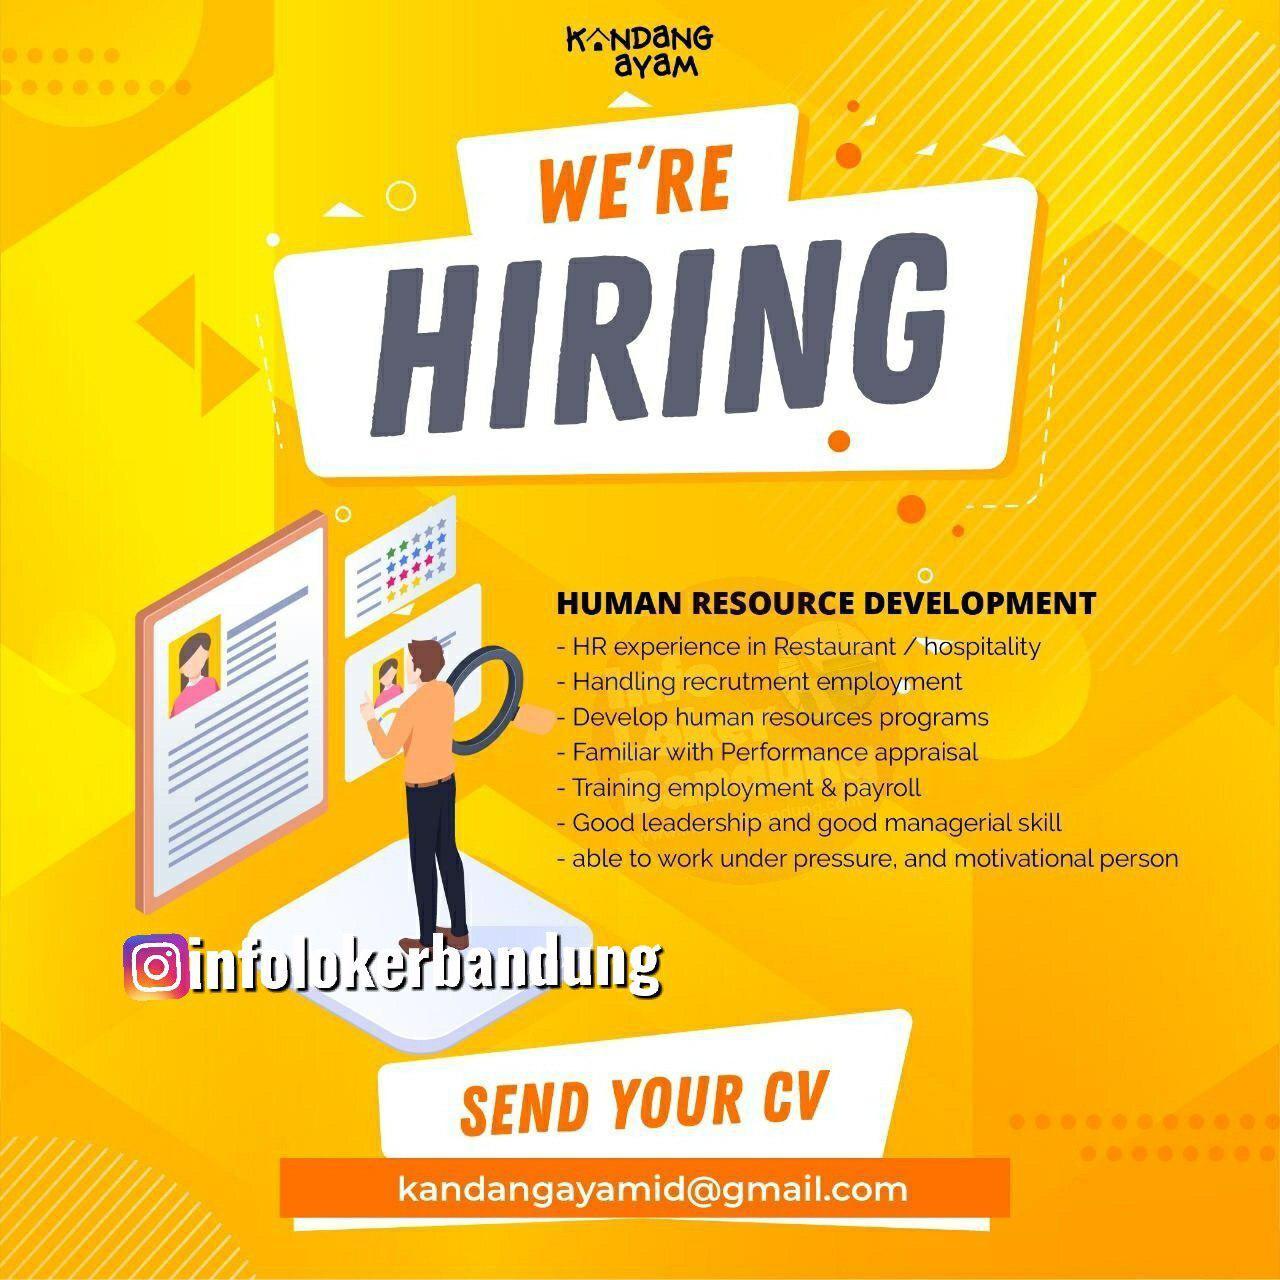 Loowngan Kerja Human Resource Development Kandang Ayam Bandung Oktober 2019